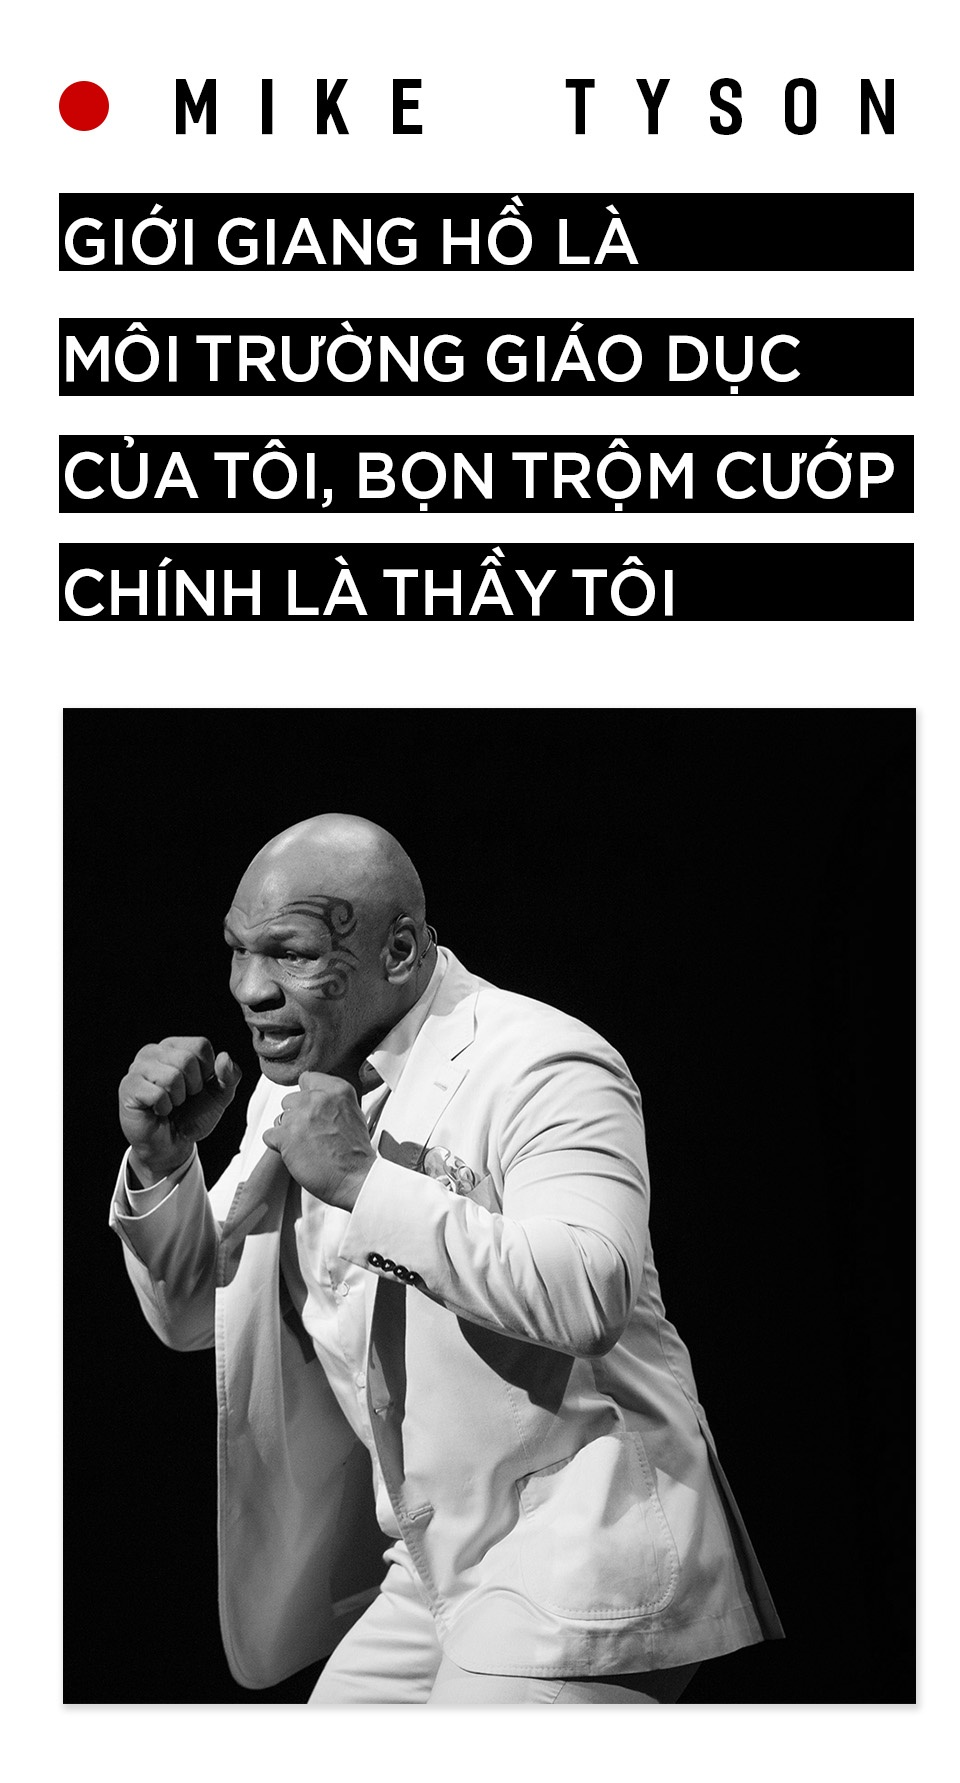 Mike Tyson - Su that tran trui: Quyen Anh, ma tuy, gai va su huy hoai hinh anh 5